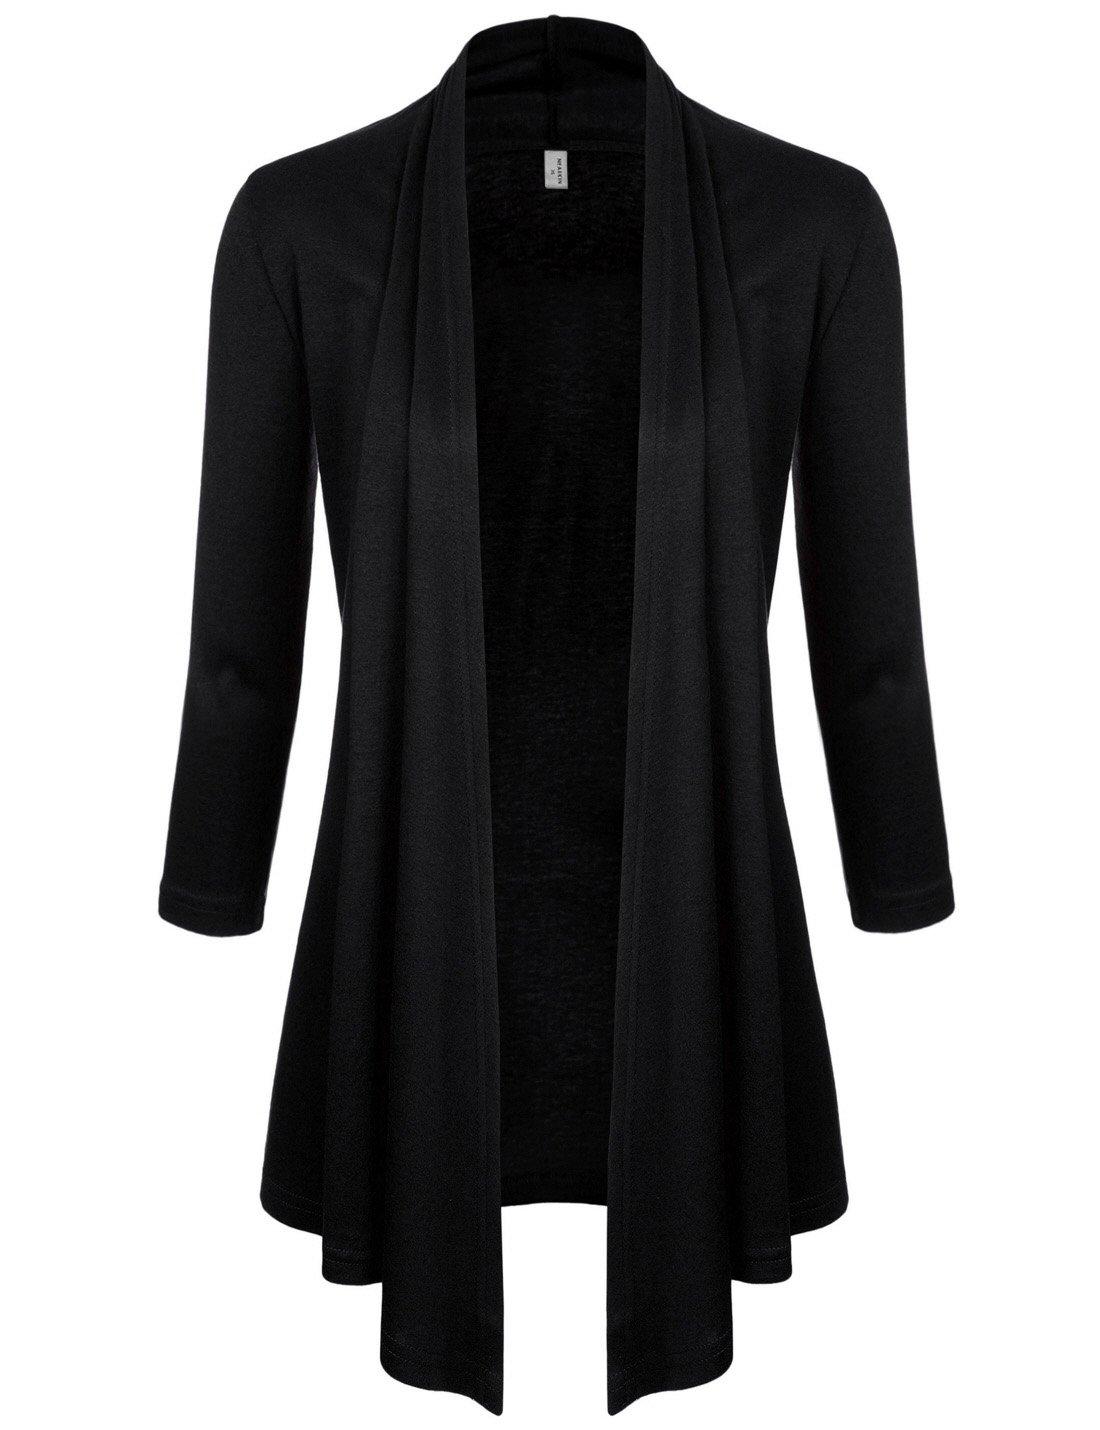 NEARKIN (NKNKWCD6937) Womens Open Front Slim Cut Look 3/4 Sleeve City Casual Cardigans BLACK US M(Tag size L)